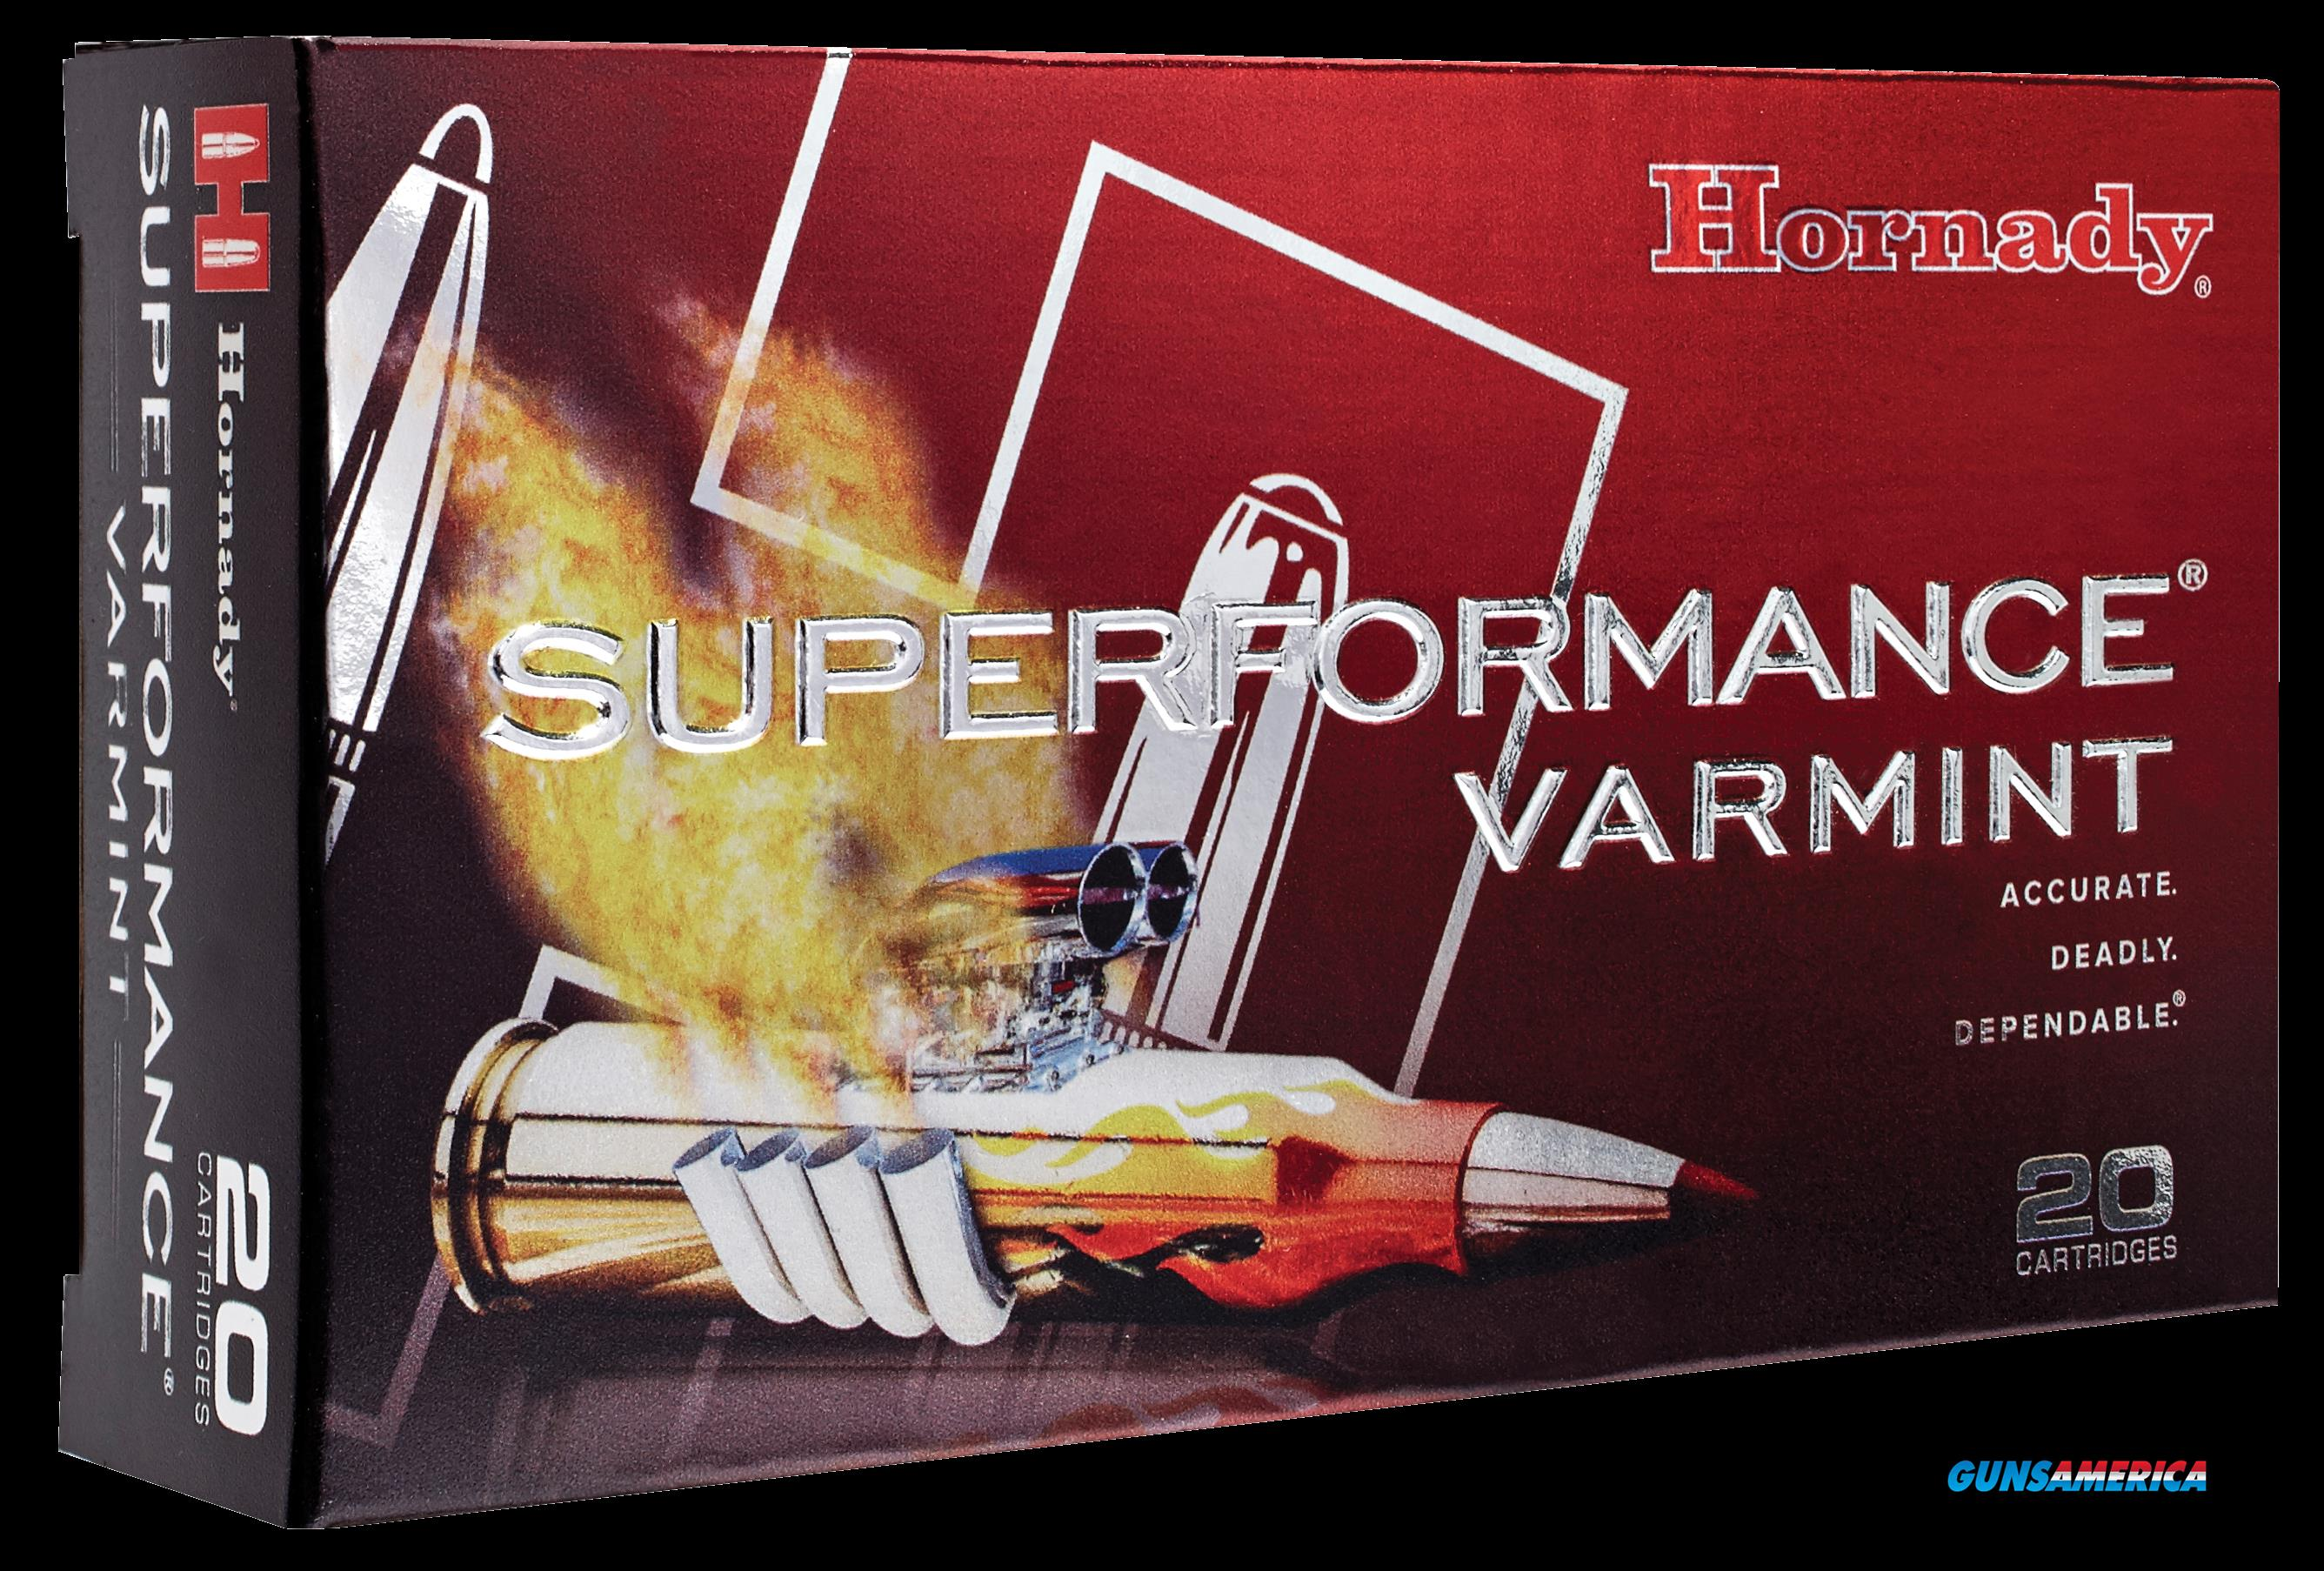 Hornady Superformance Varmint, Horn*8316  222 Rem  50 Vmax Spf  20-10  Guns > Pistols > 1911 Pistol Copies (non-Colt)